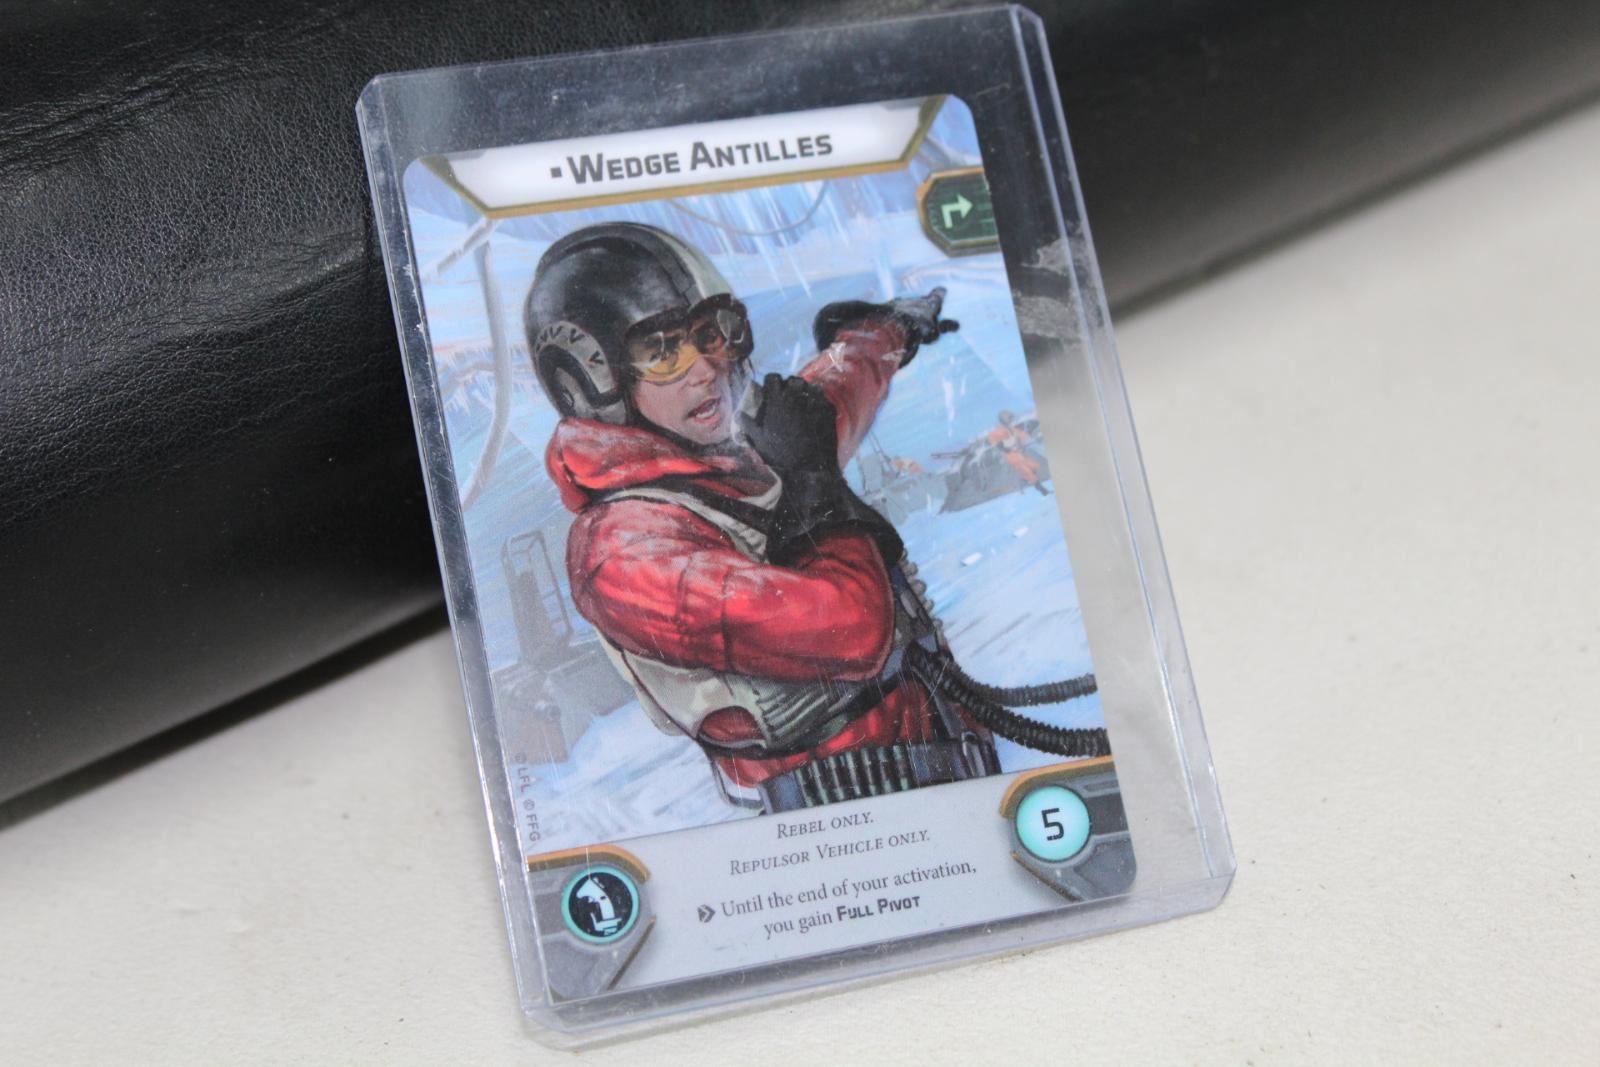 LEGION Star Wars Card Wedge Antilles General Weiss Gen-Con 2018 Promo Card NEW